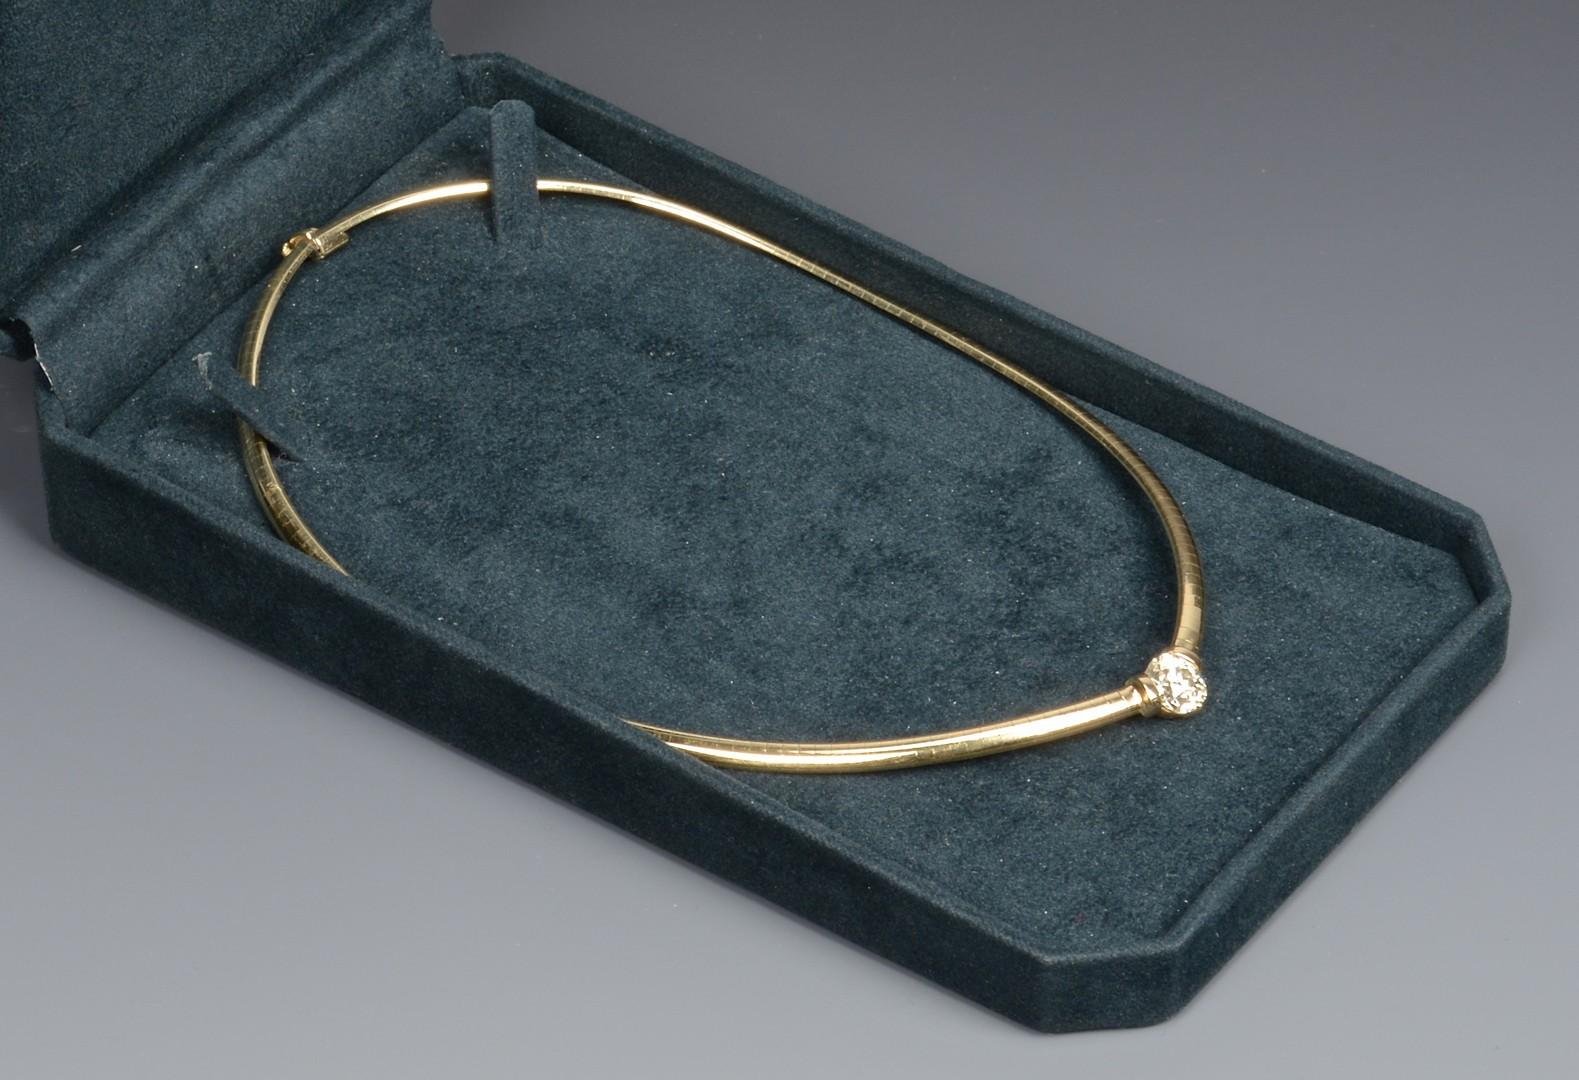 Lot 390: 14k 2.35 ct OMC diamond necklace